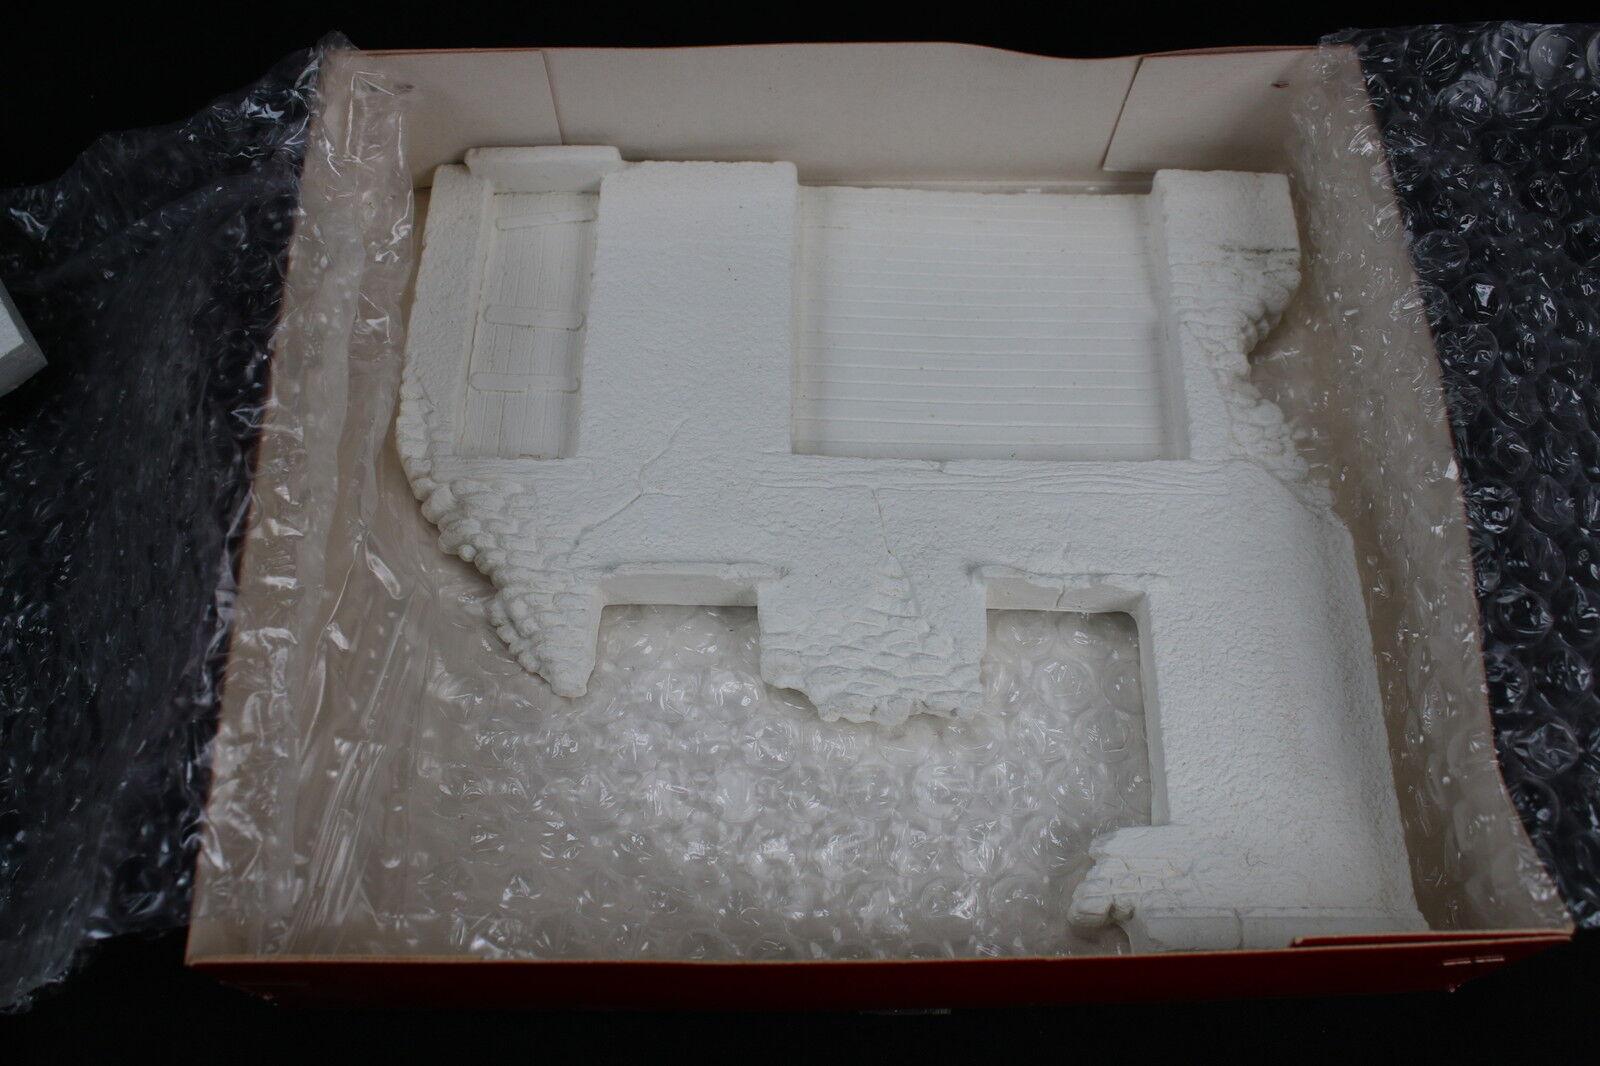 YY020 JMP productions rare construction plâtre 35036 Ruine garage garage garage diorama rue 079525